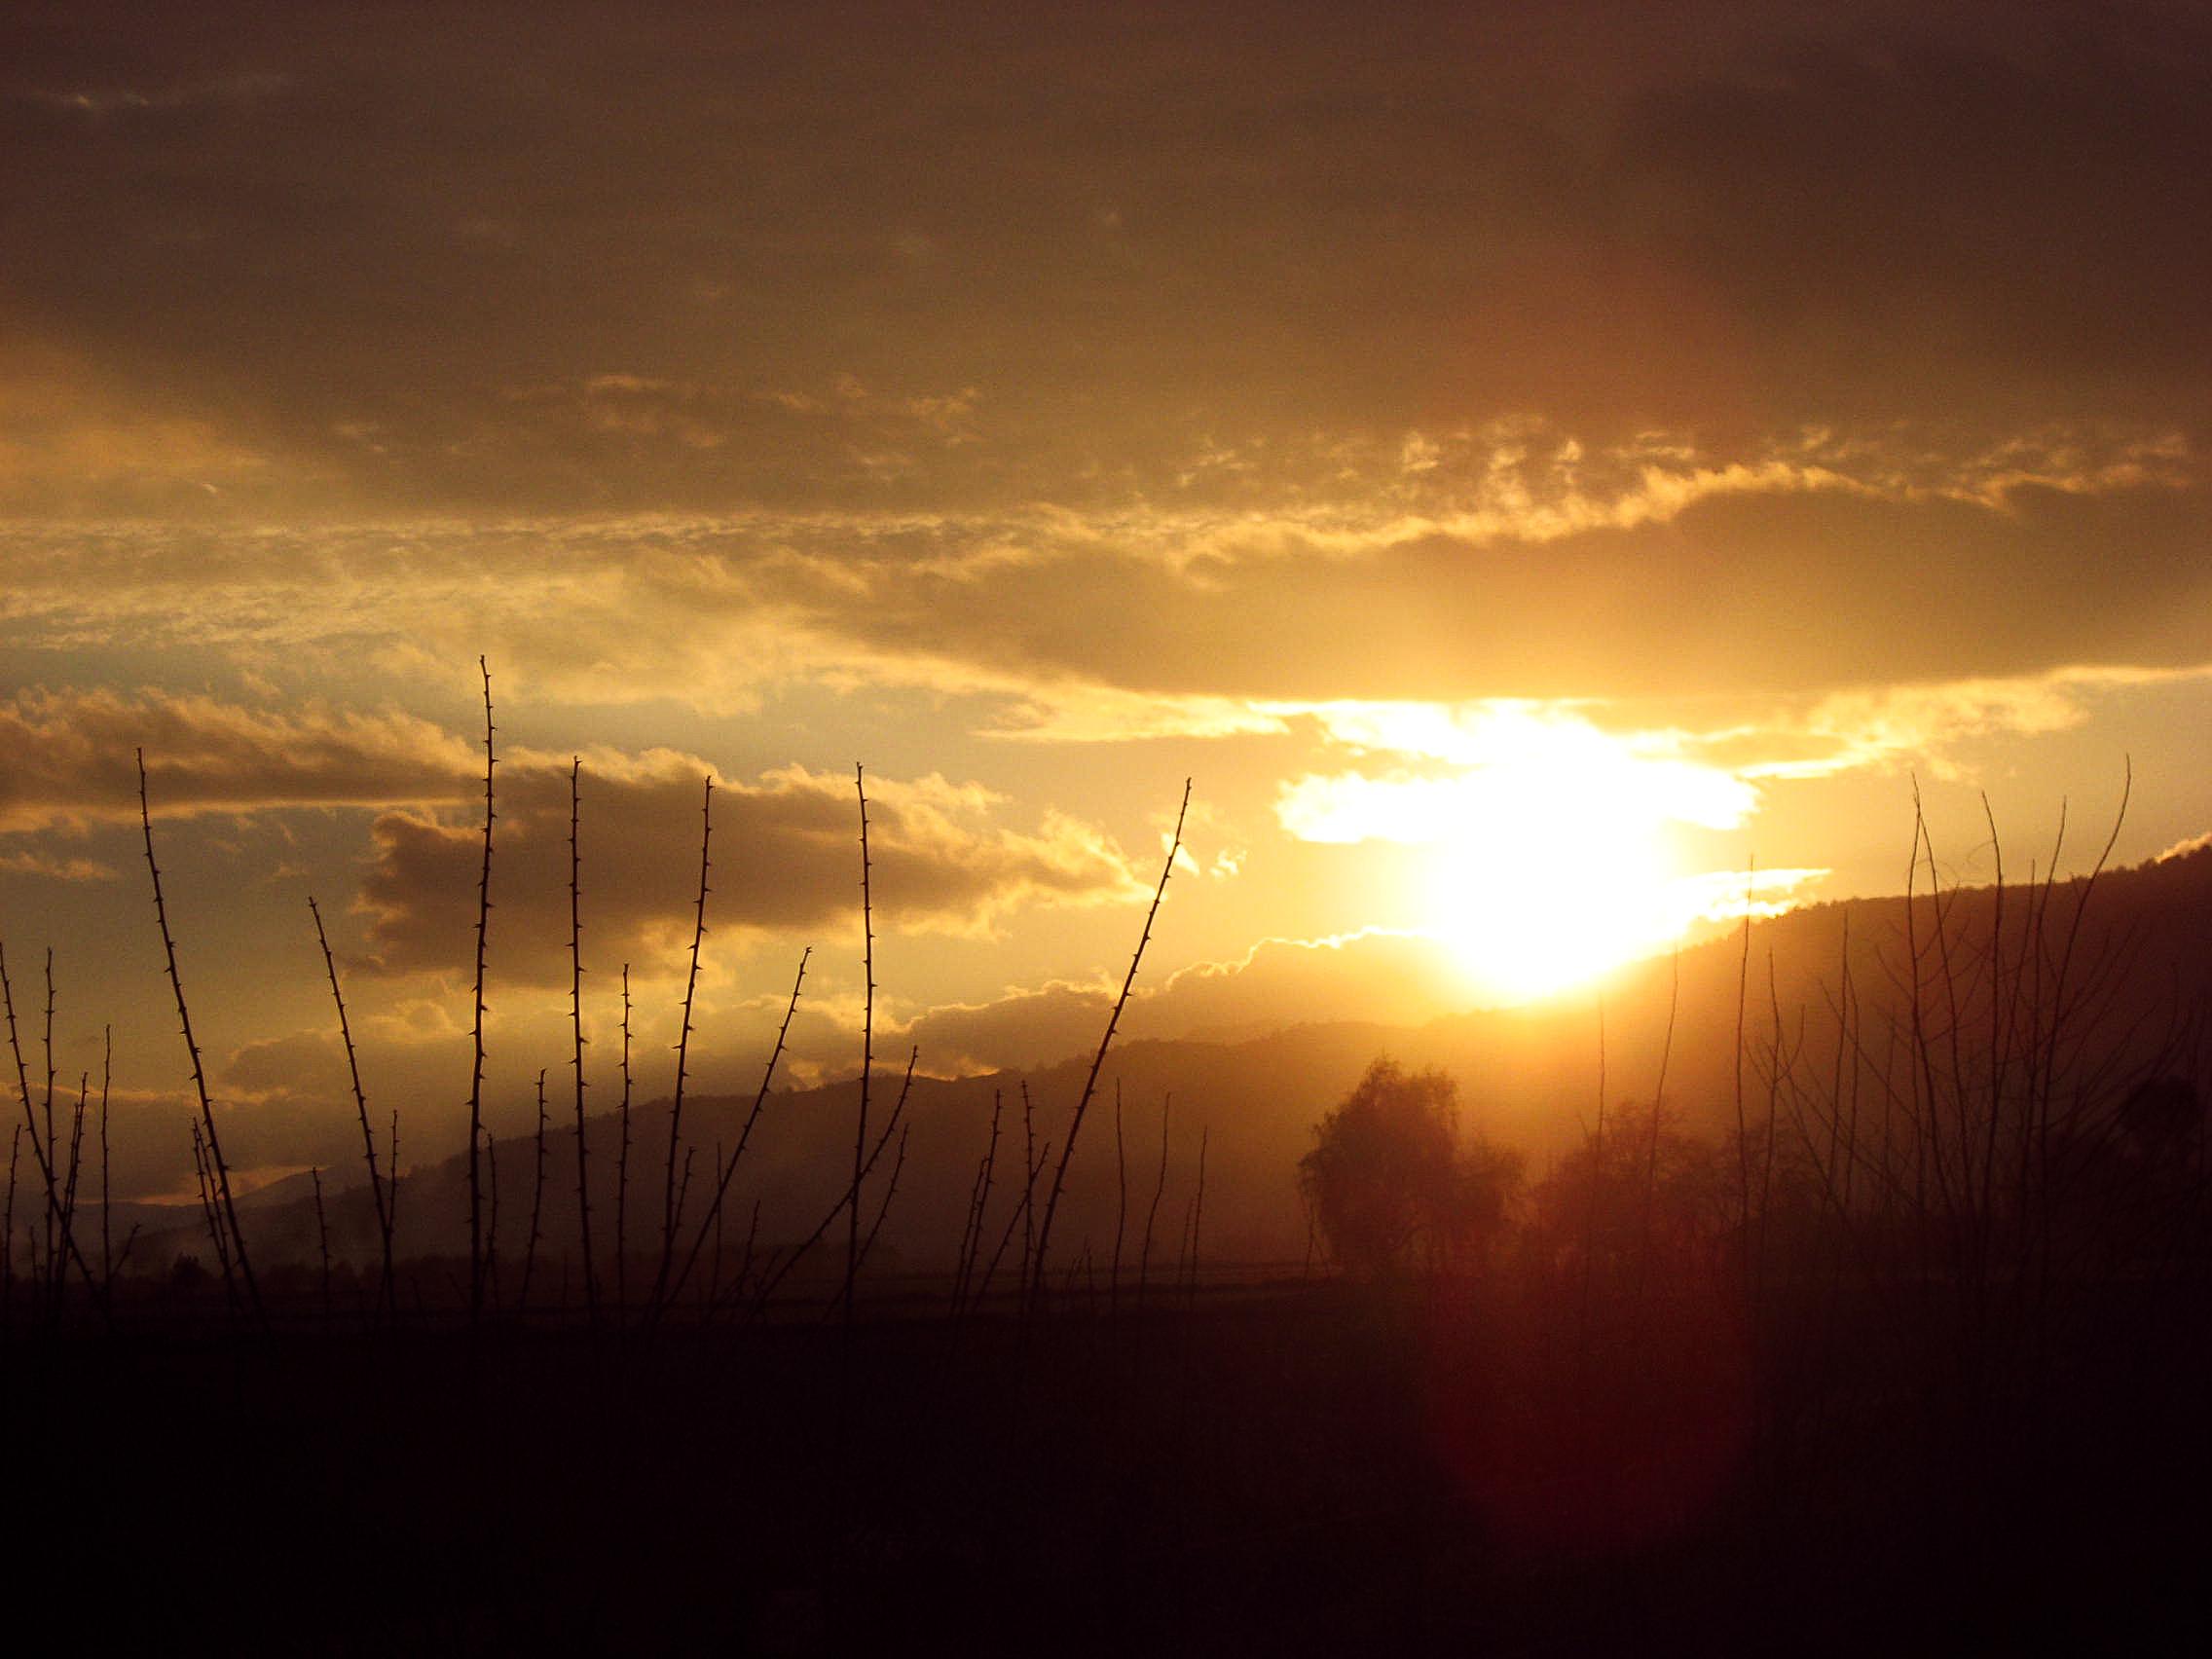 sant_PLACE_horseriding-0557-_sunset-through-vines.jpg